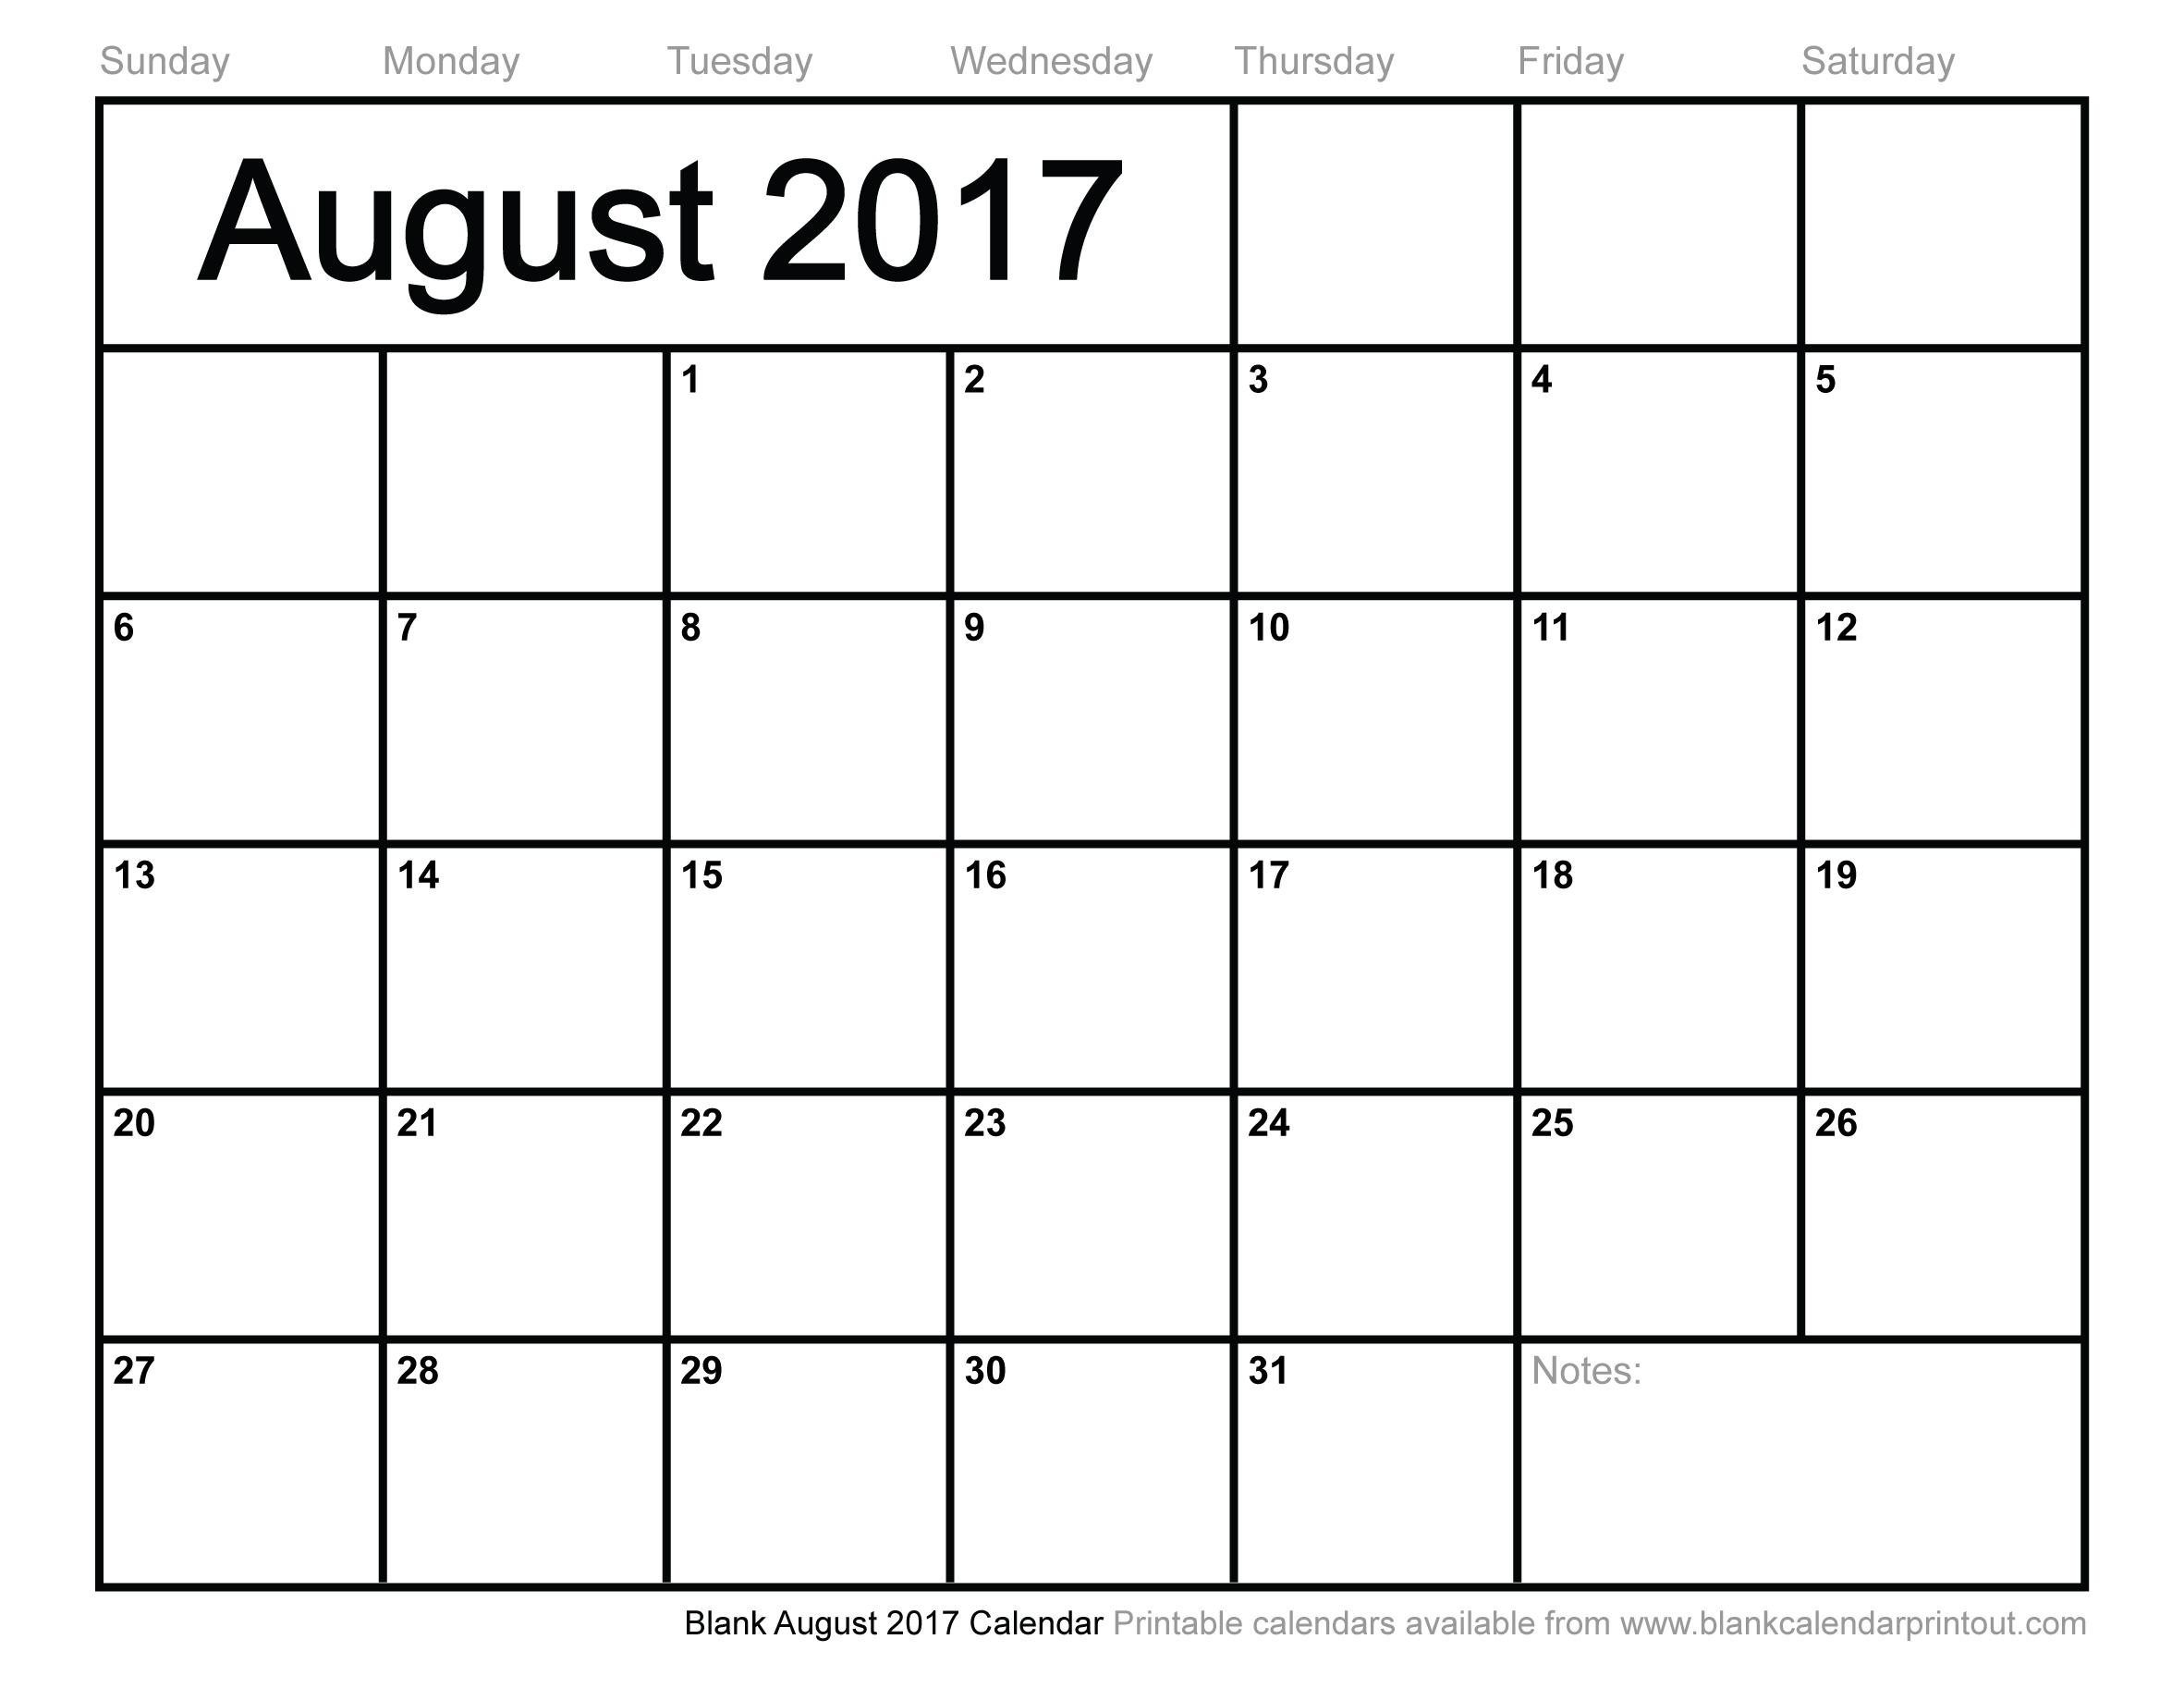 Blank August 2017 Calendar To Print for Blank Calendars For August